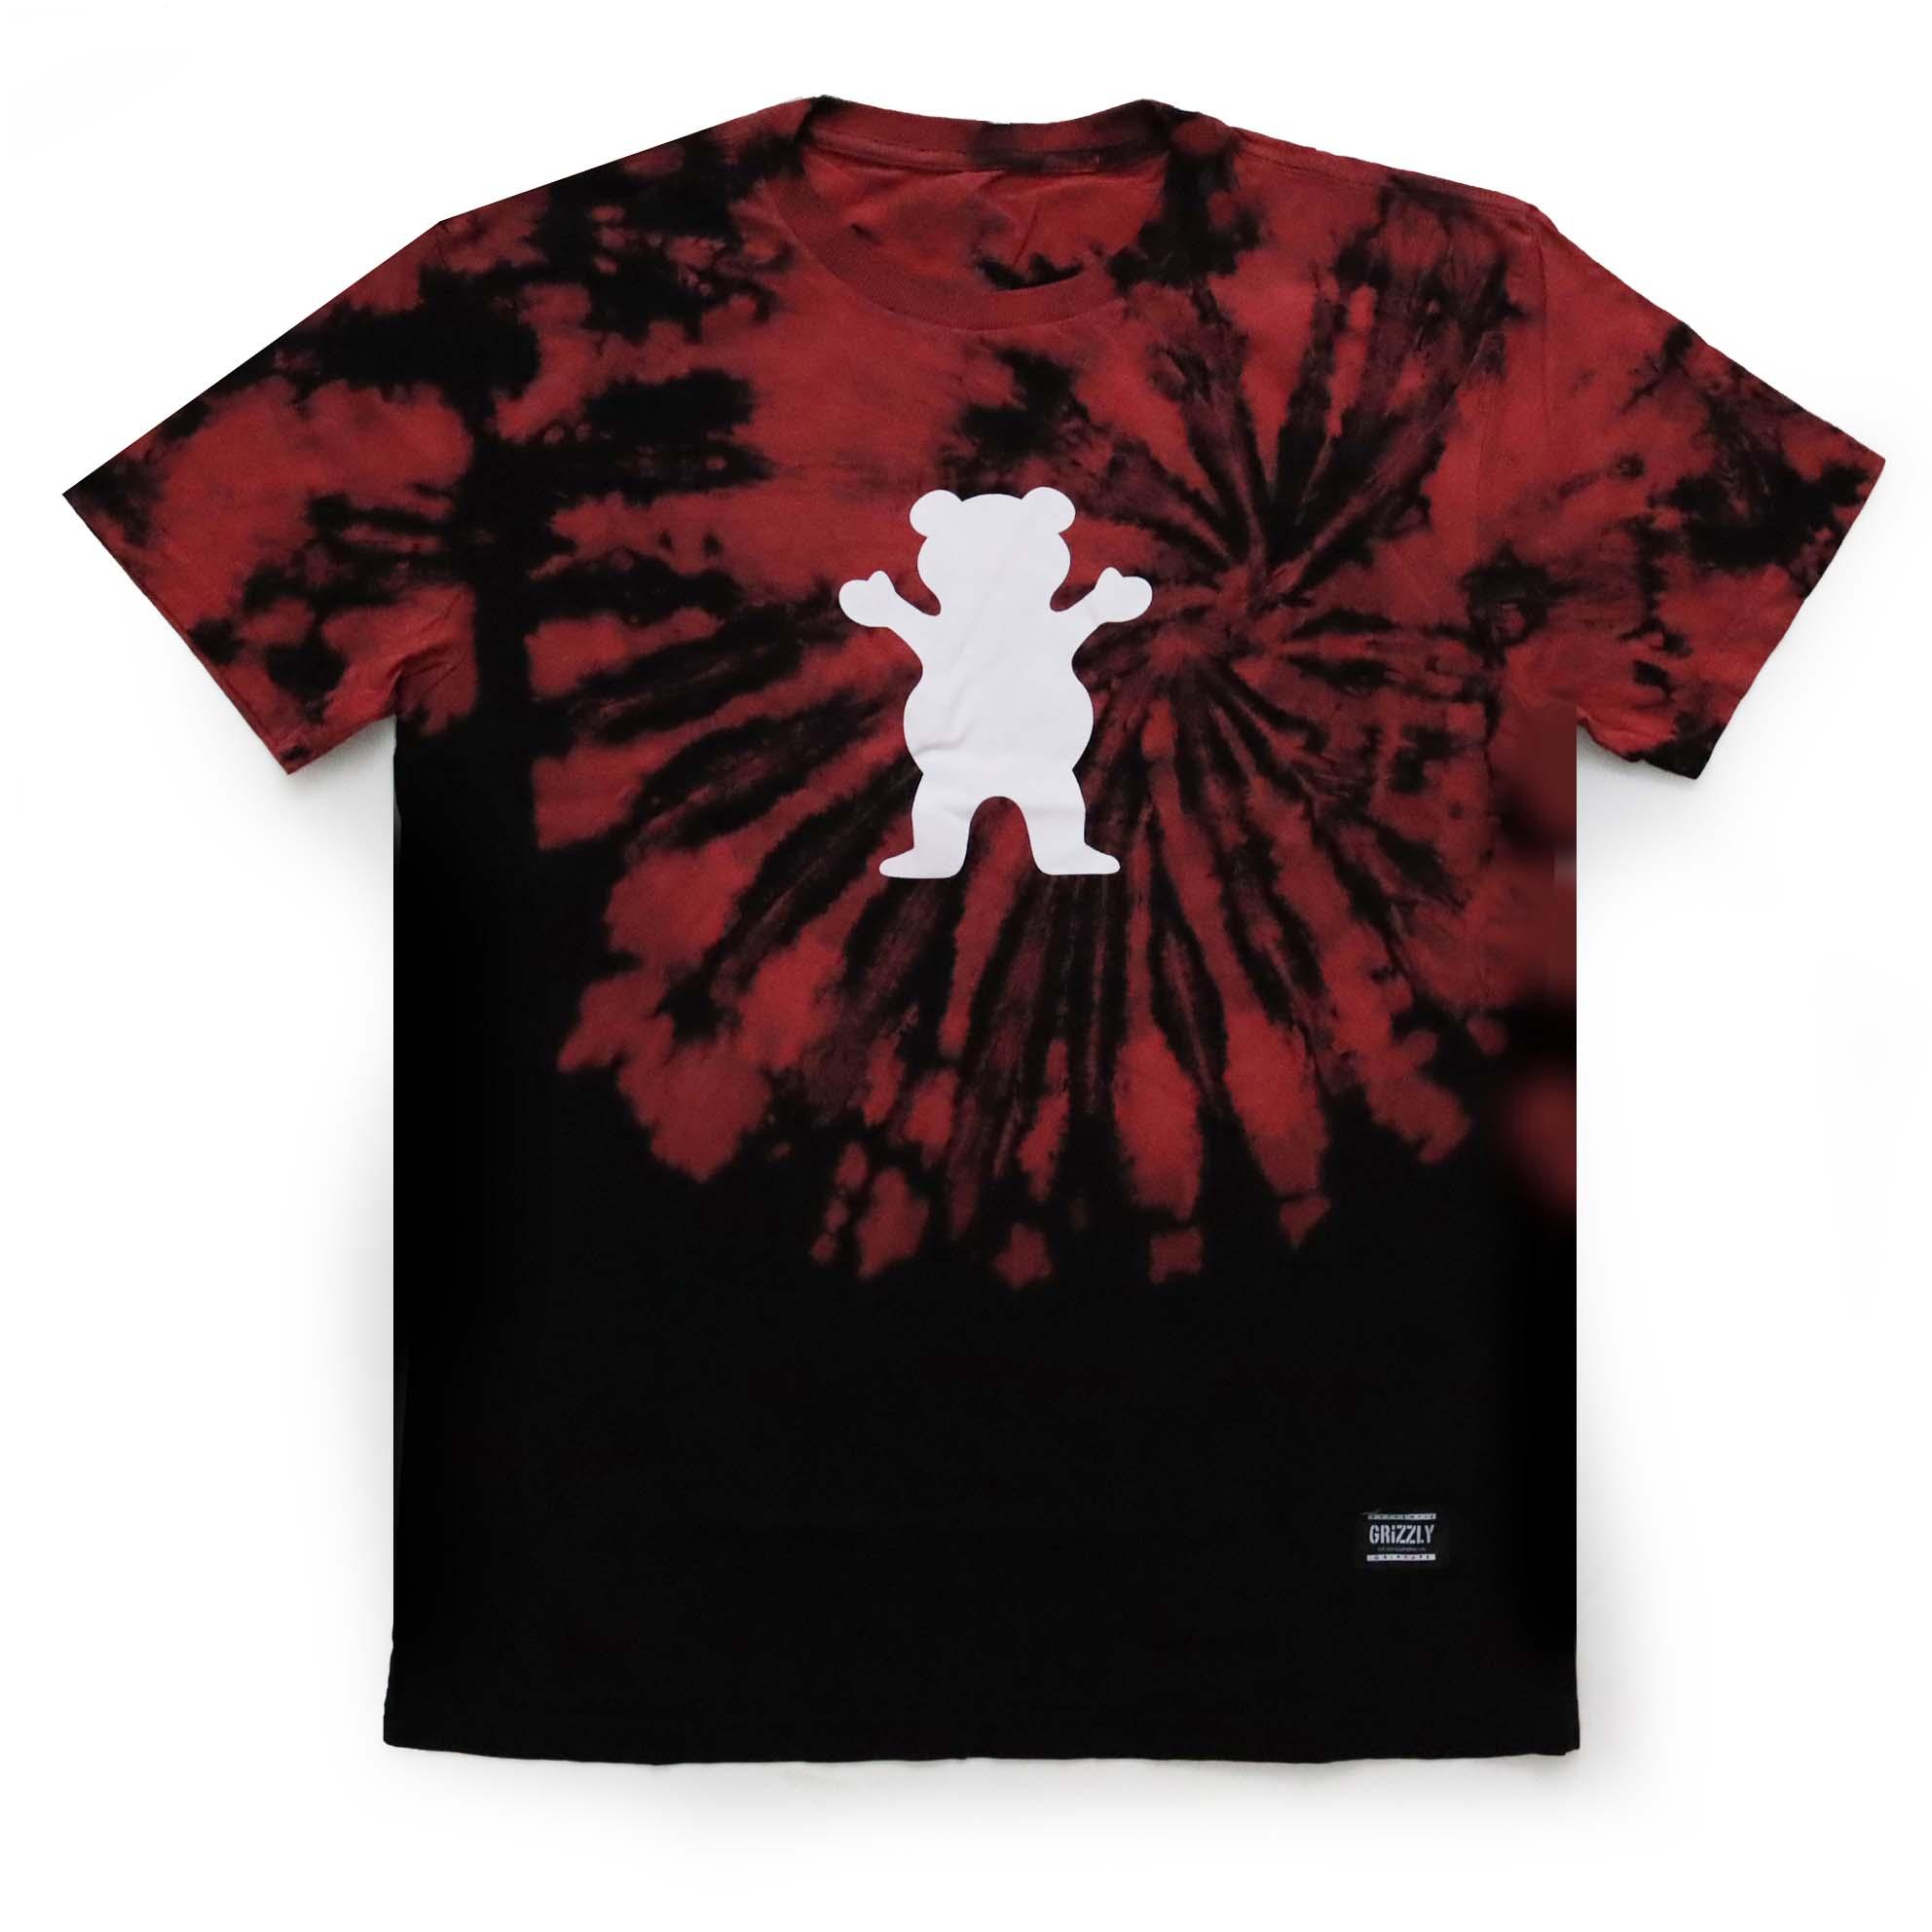 Camiseta Grizzly Og Bear Fruit Punch - Tie Dye